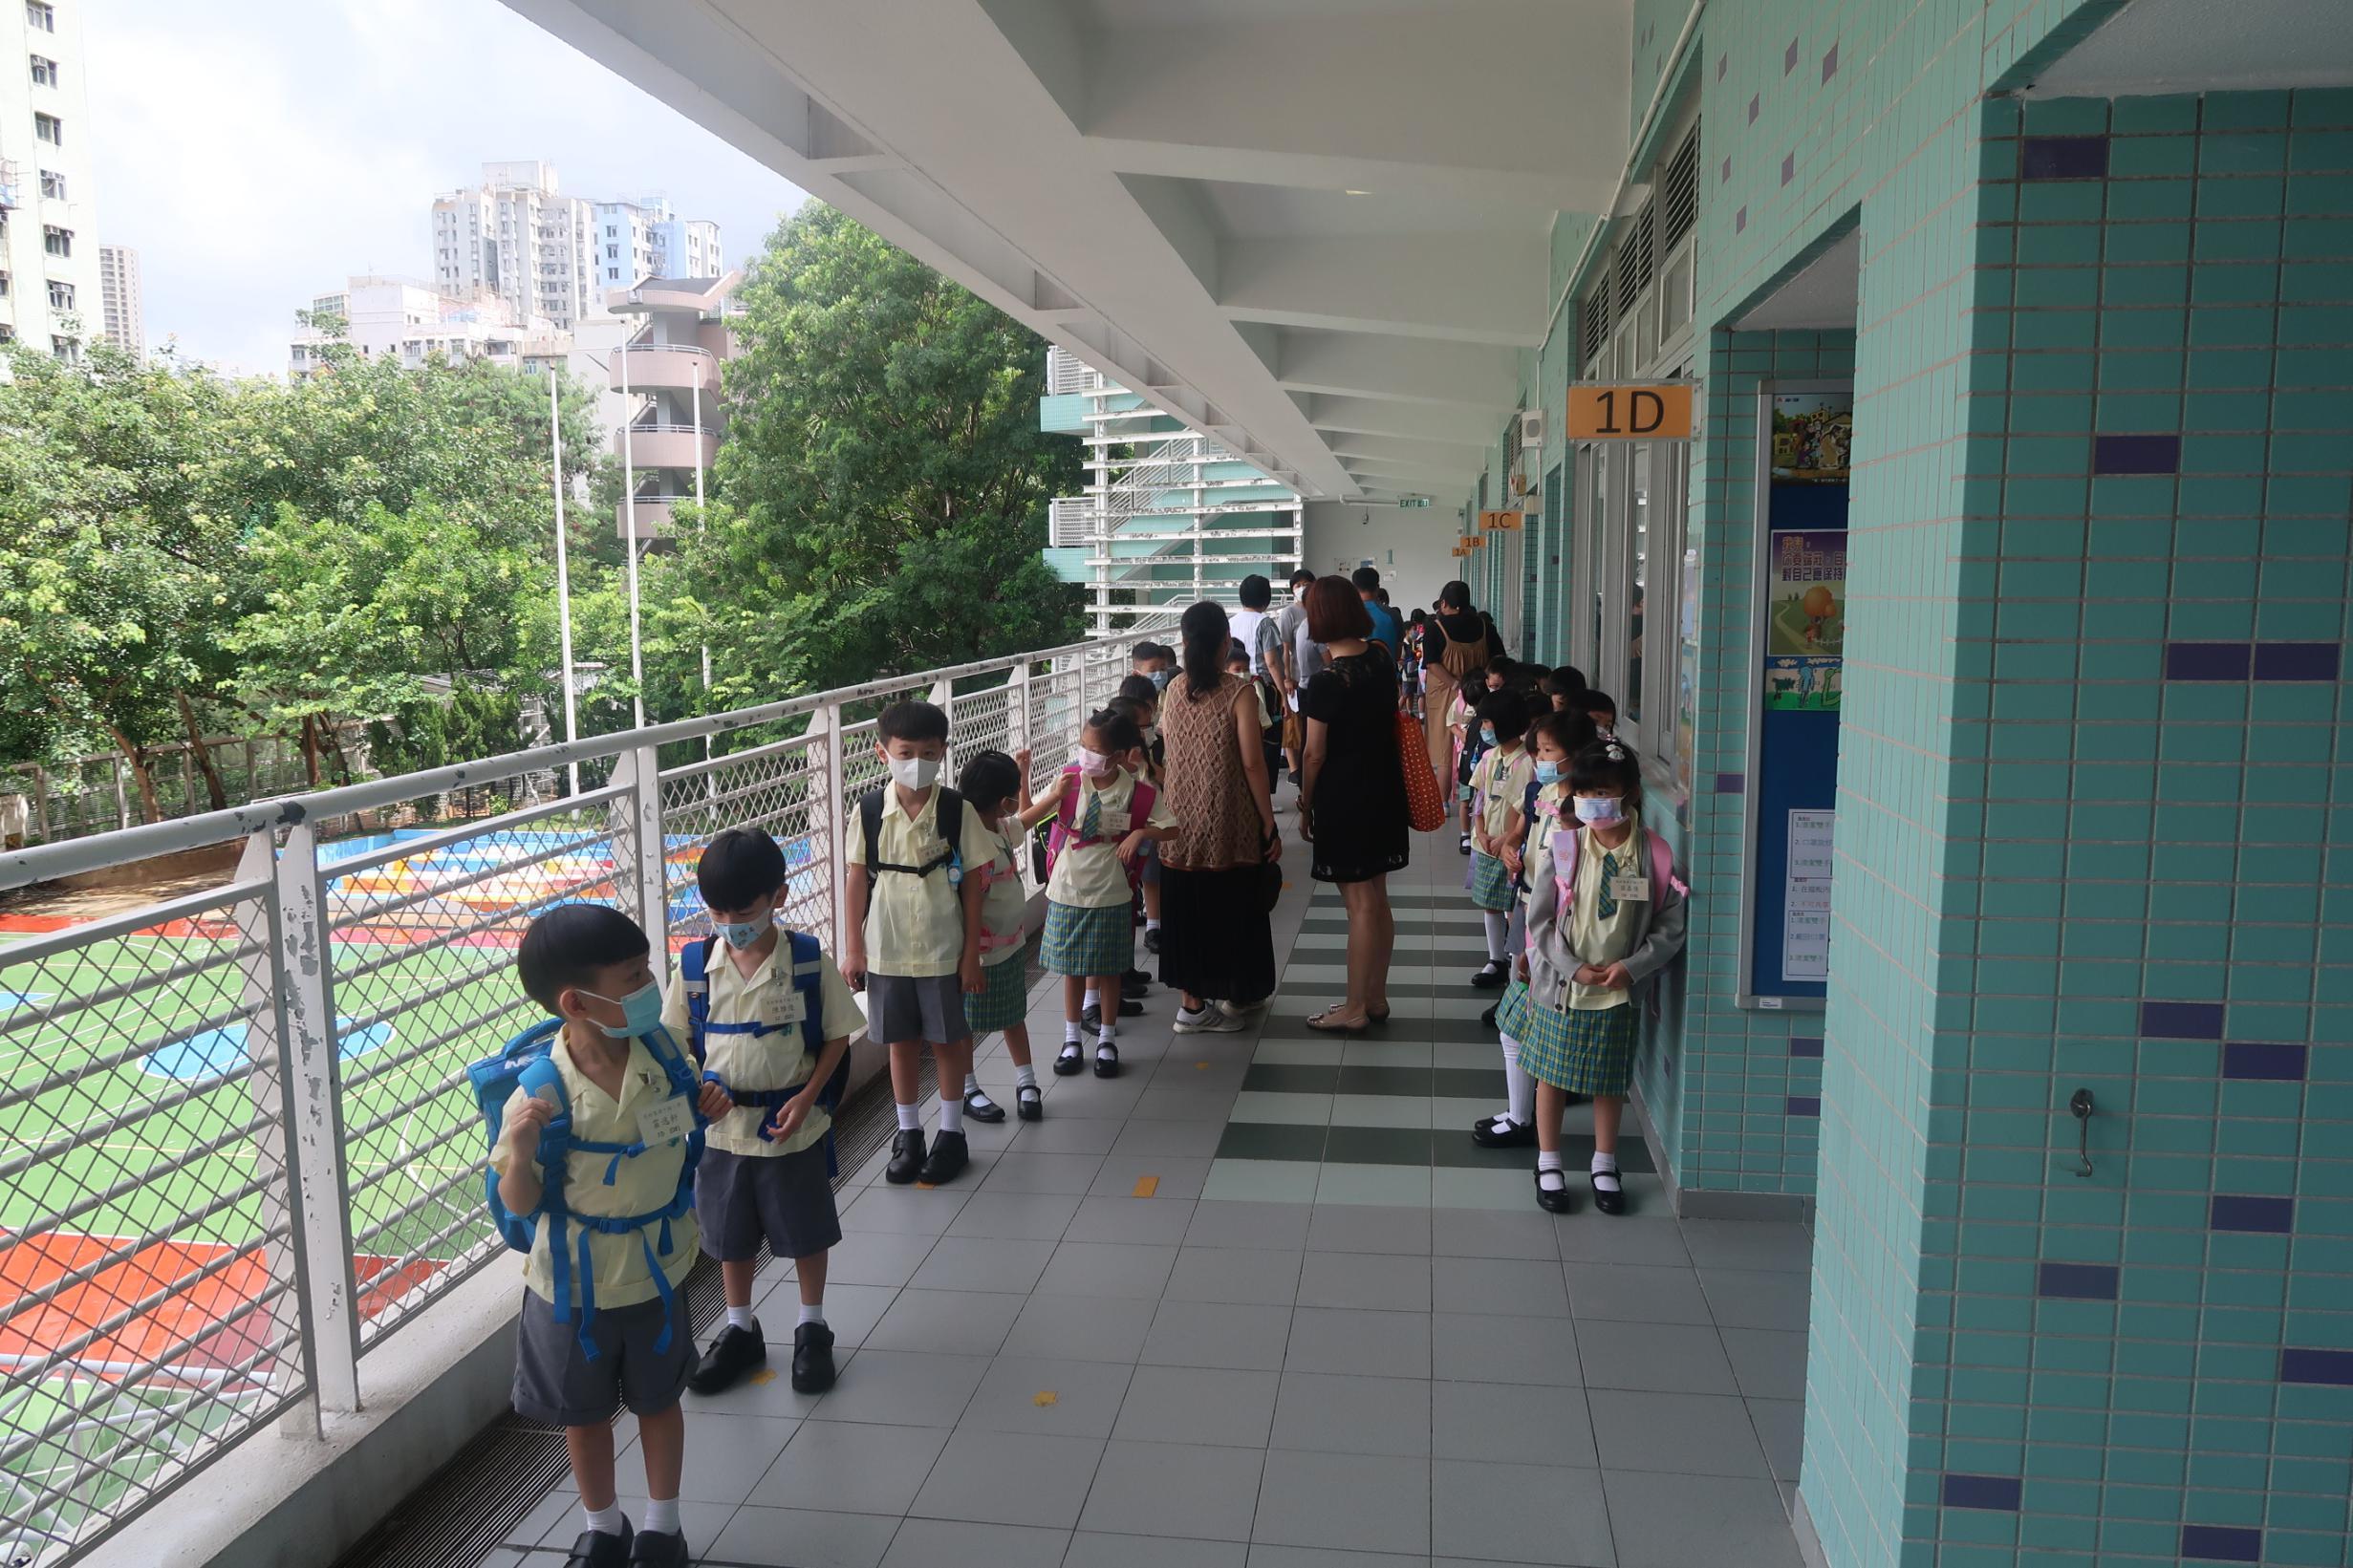 https://syh.edu.hk/sites/default/files/img_6790_1.jpg